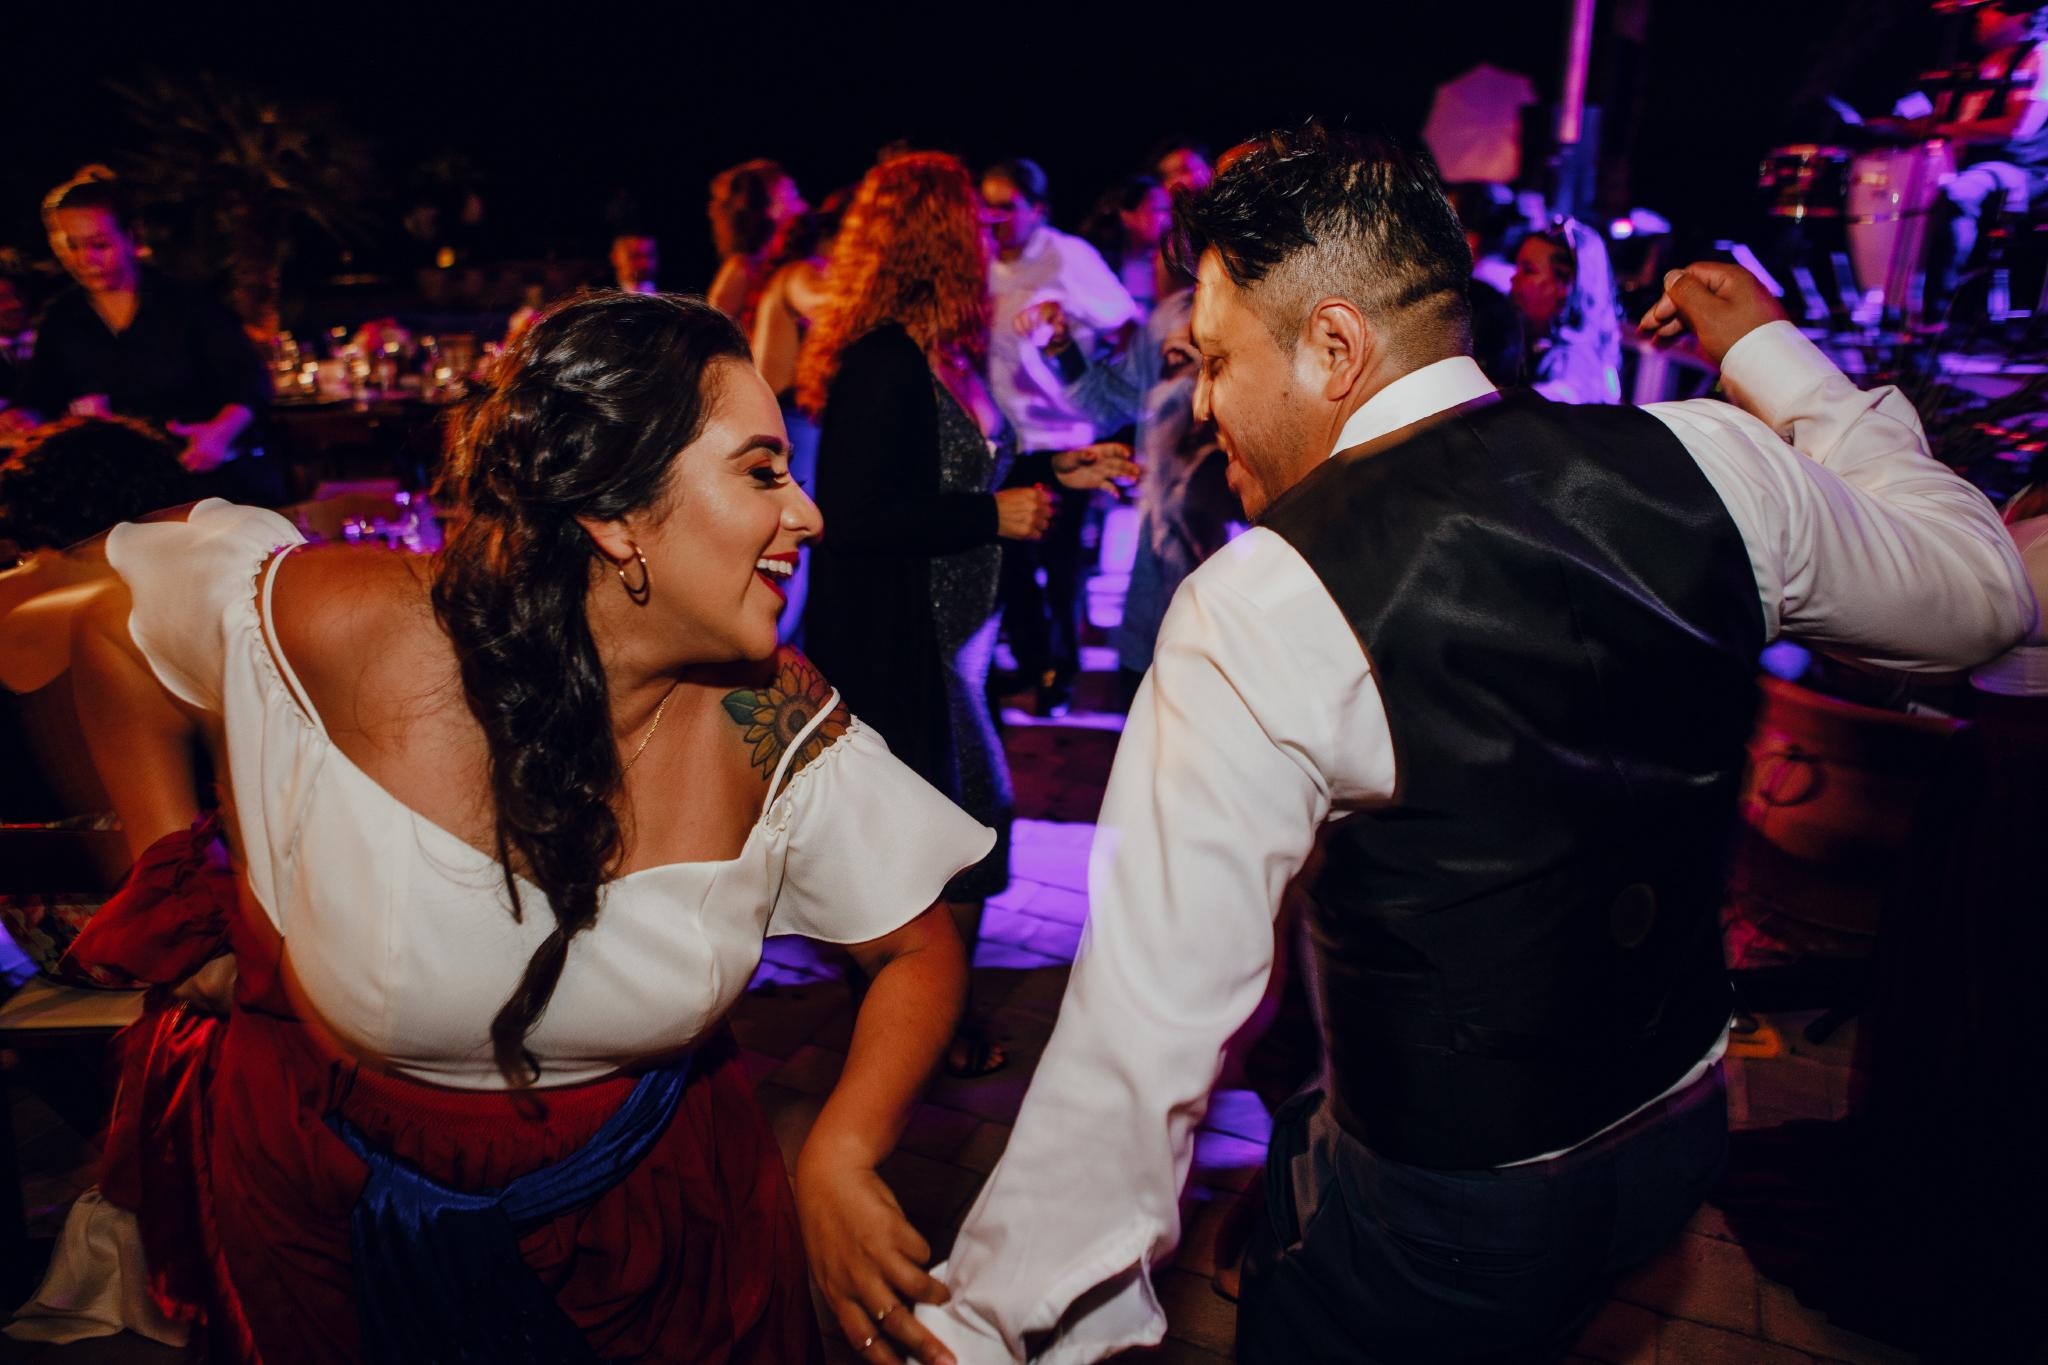 San Diego Wedding Photographer | party during wedding reception